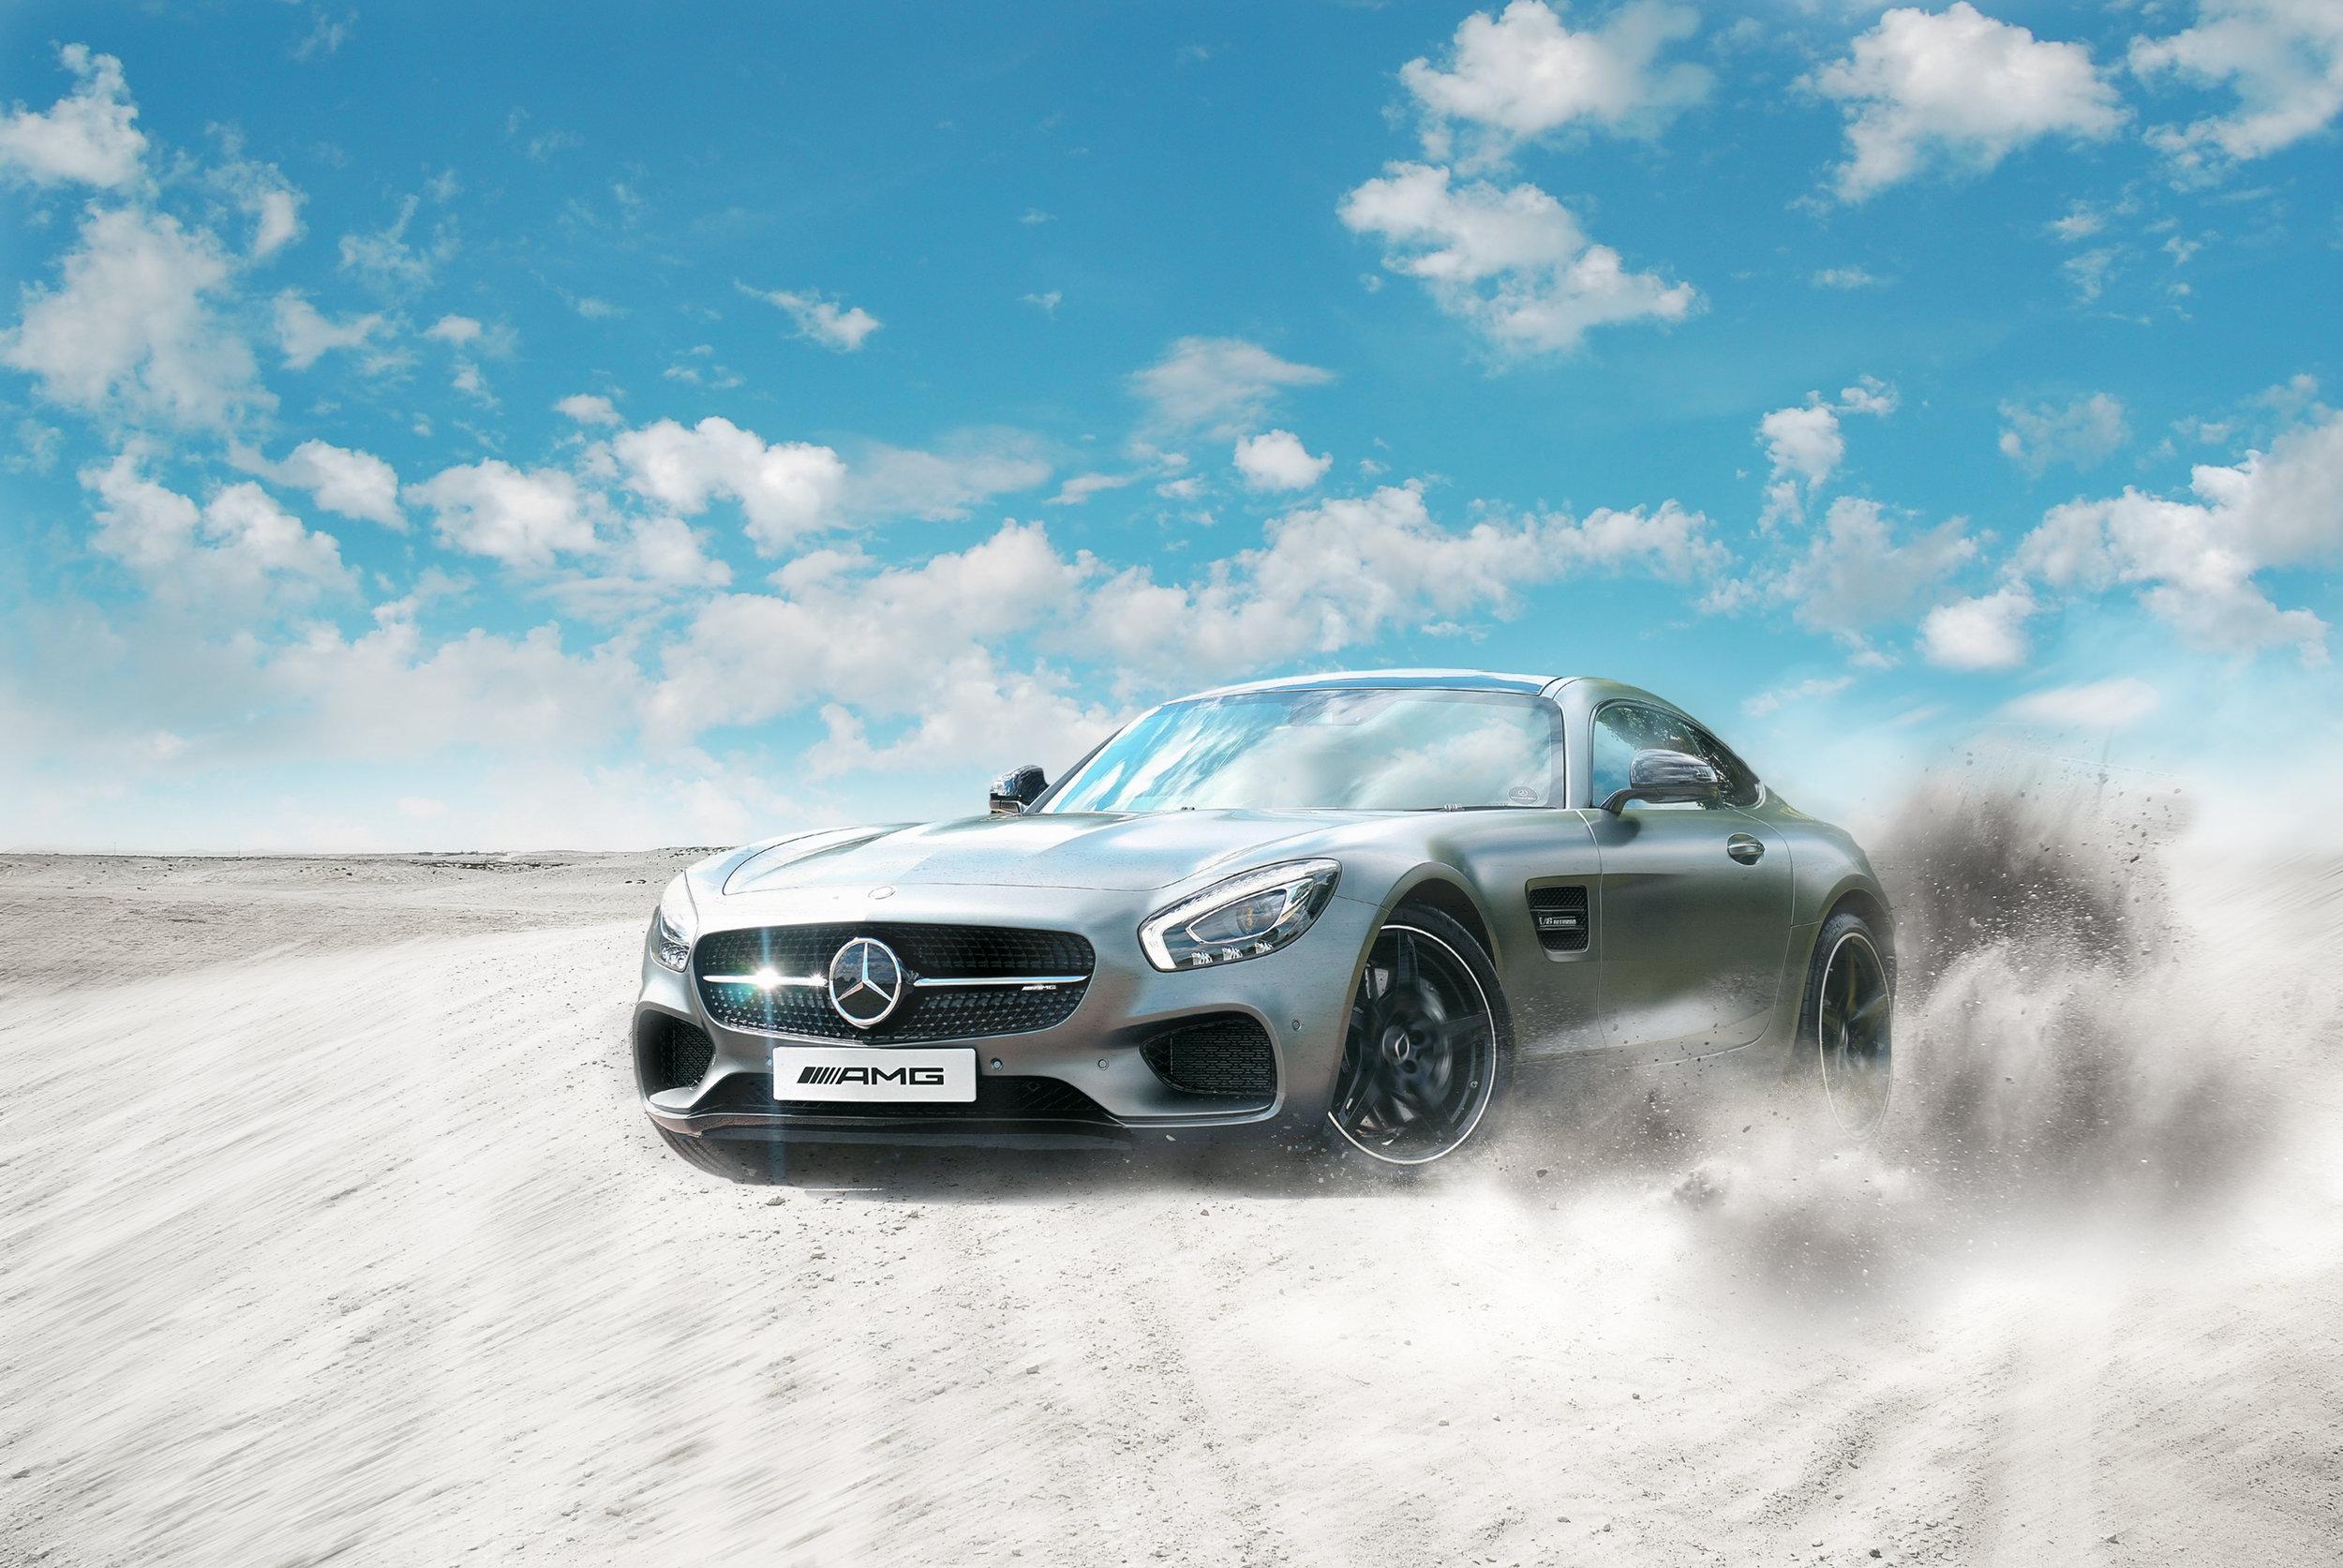 Salt_desert_car.jpg